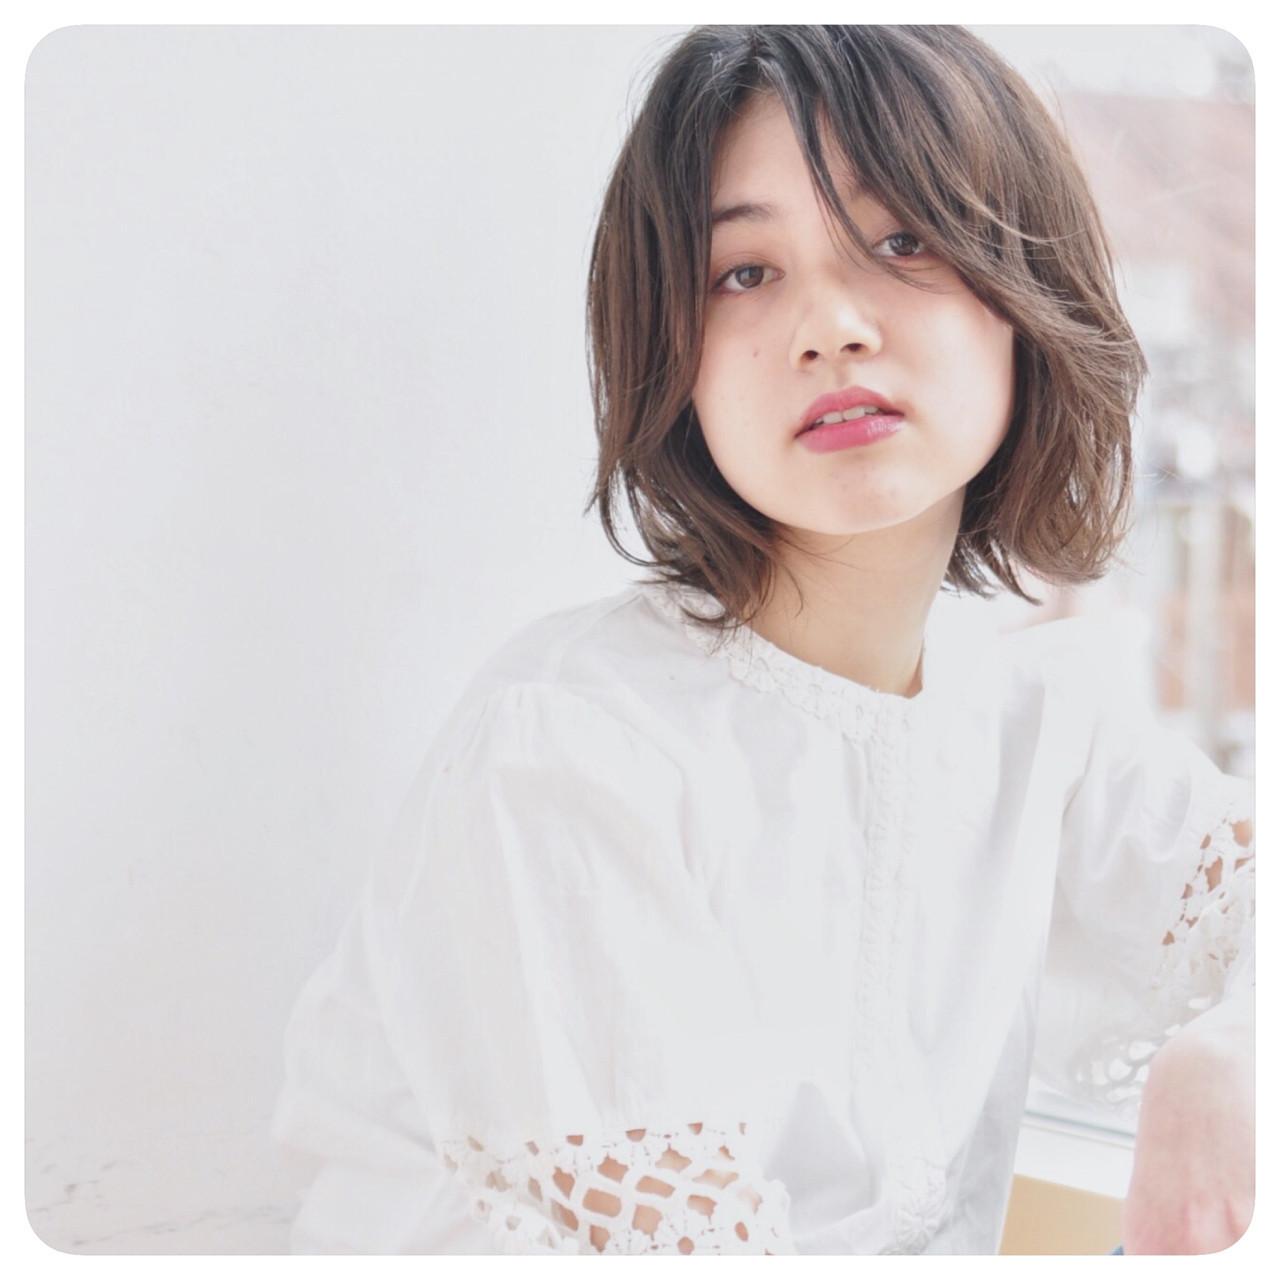 Nari46